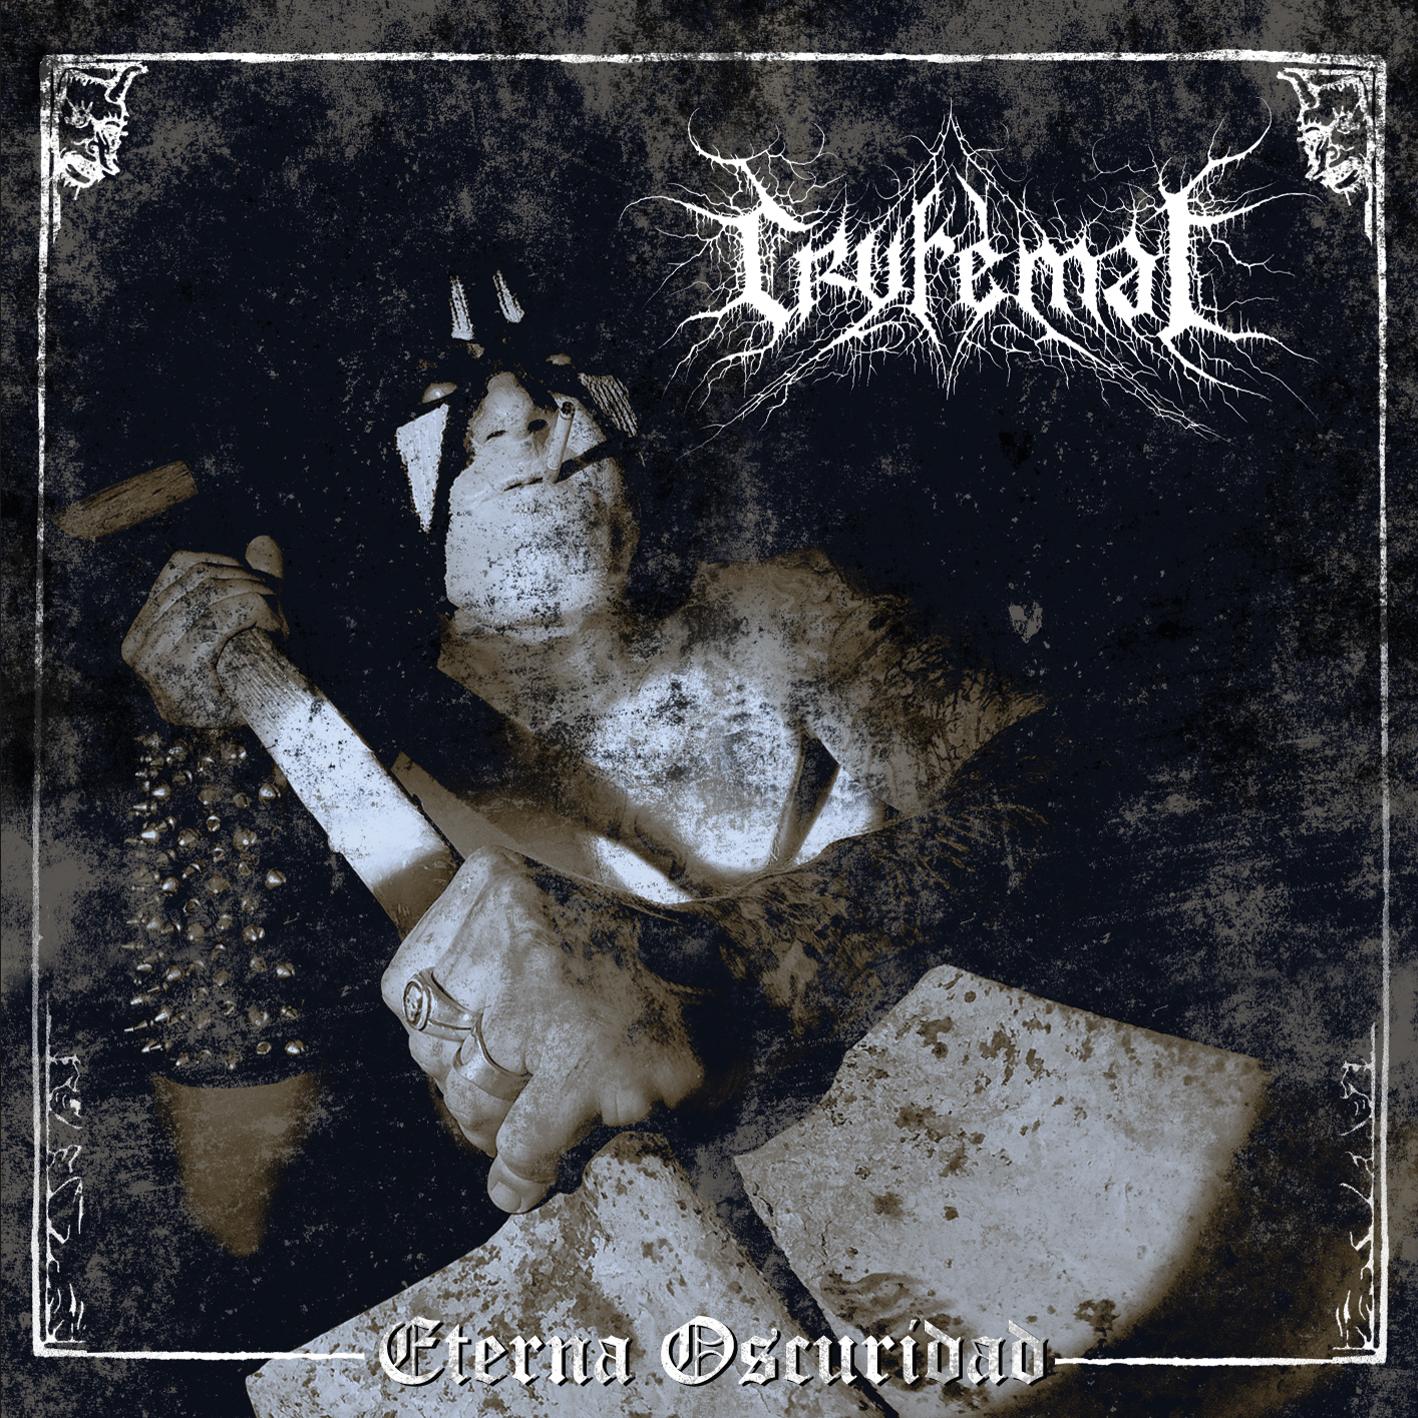 Cryfemal - Eterna Oscuridad cover 2020